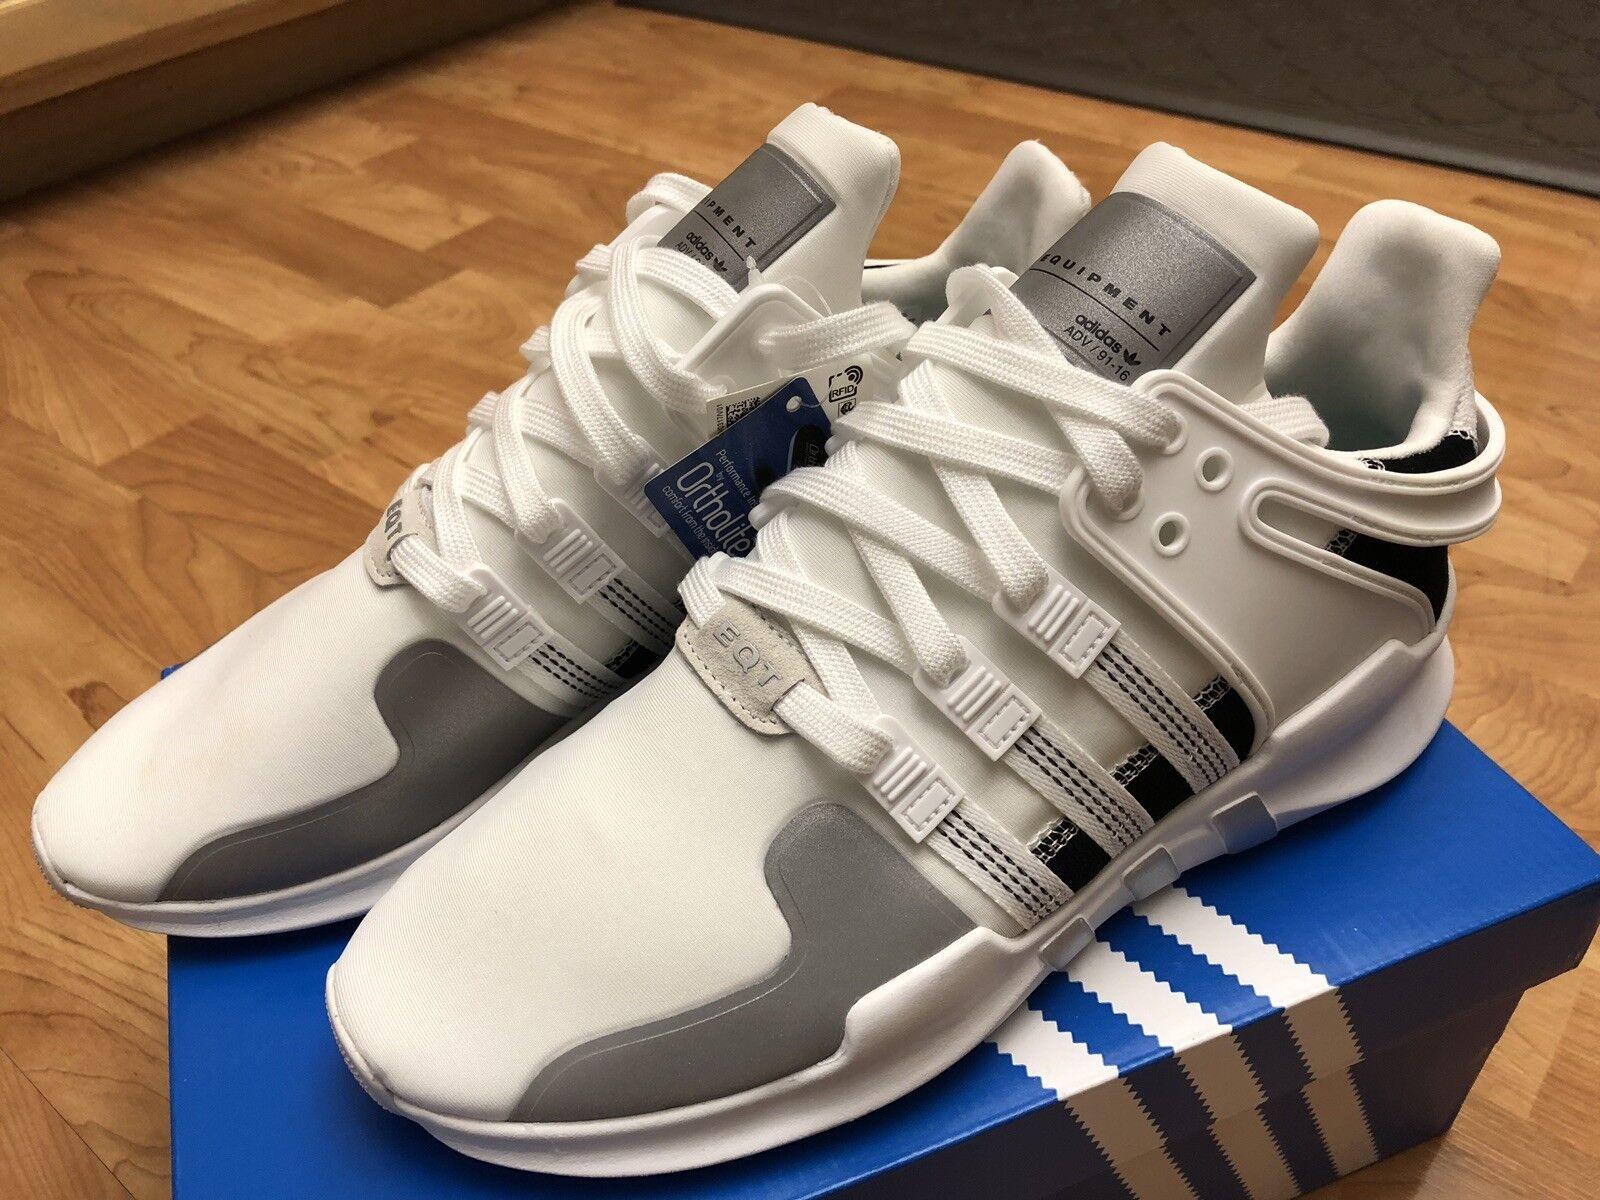 NEW RARE Adidas Equipment EQT Support 91 16 ADV WHITE blueE Size 11.5